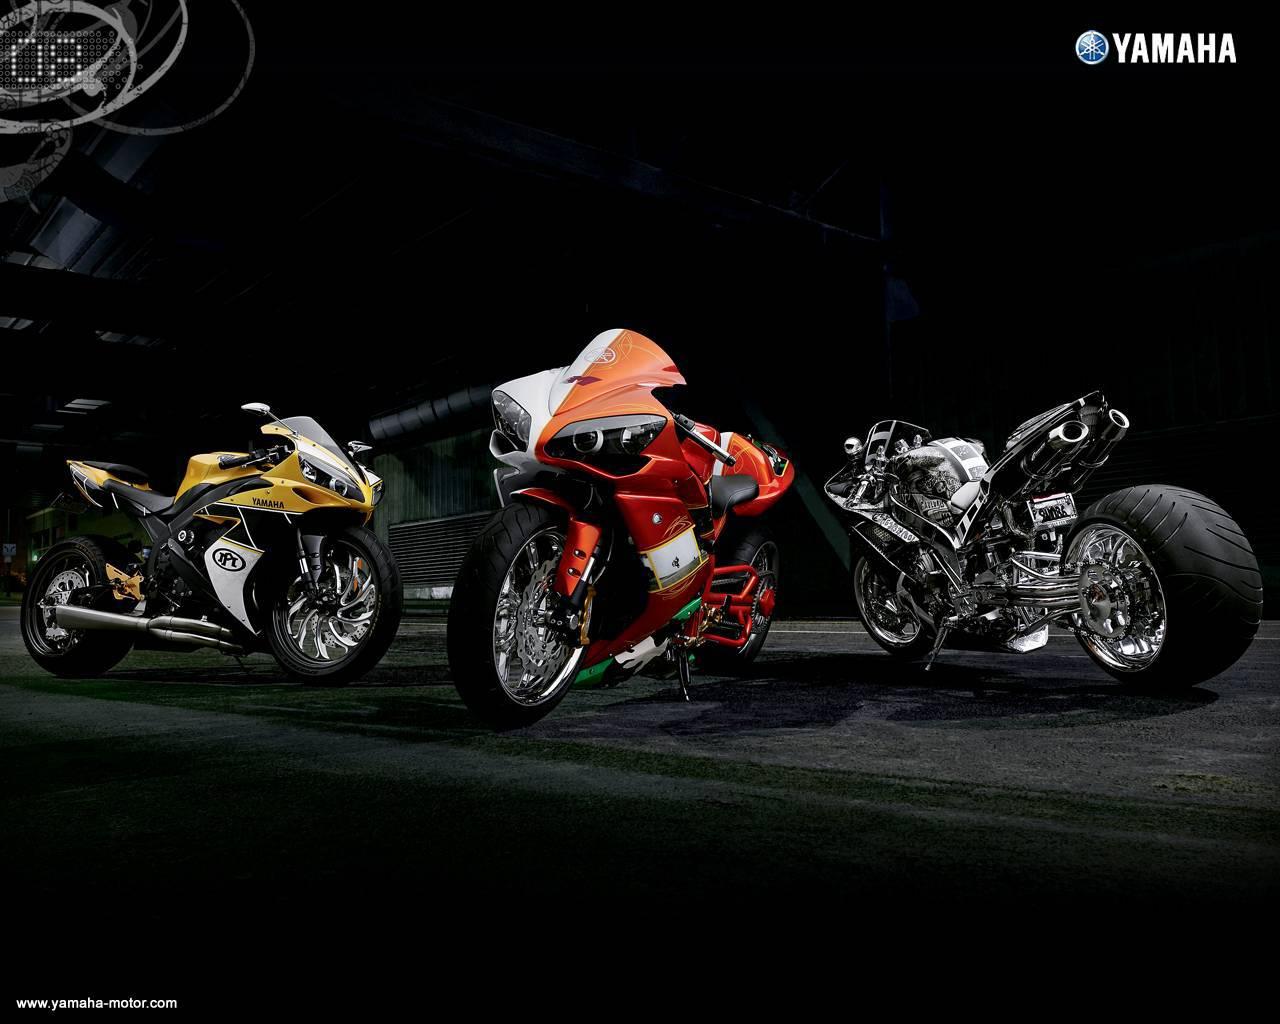 Motos Deportivas (varias marcas)